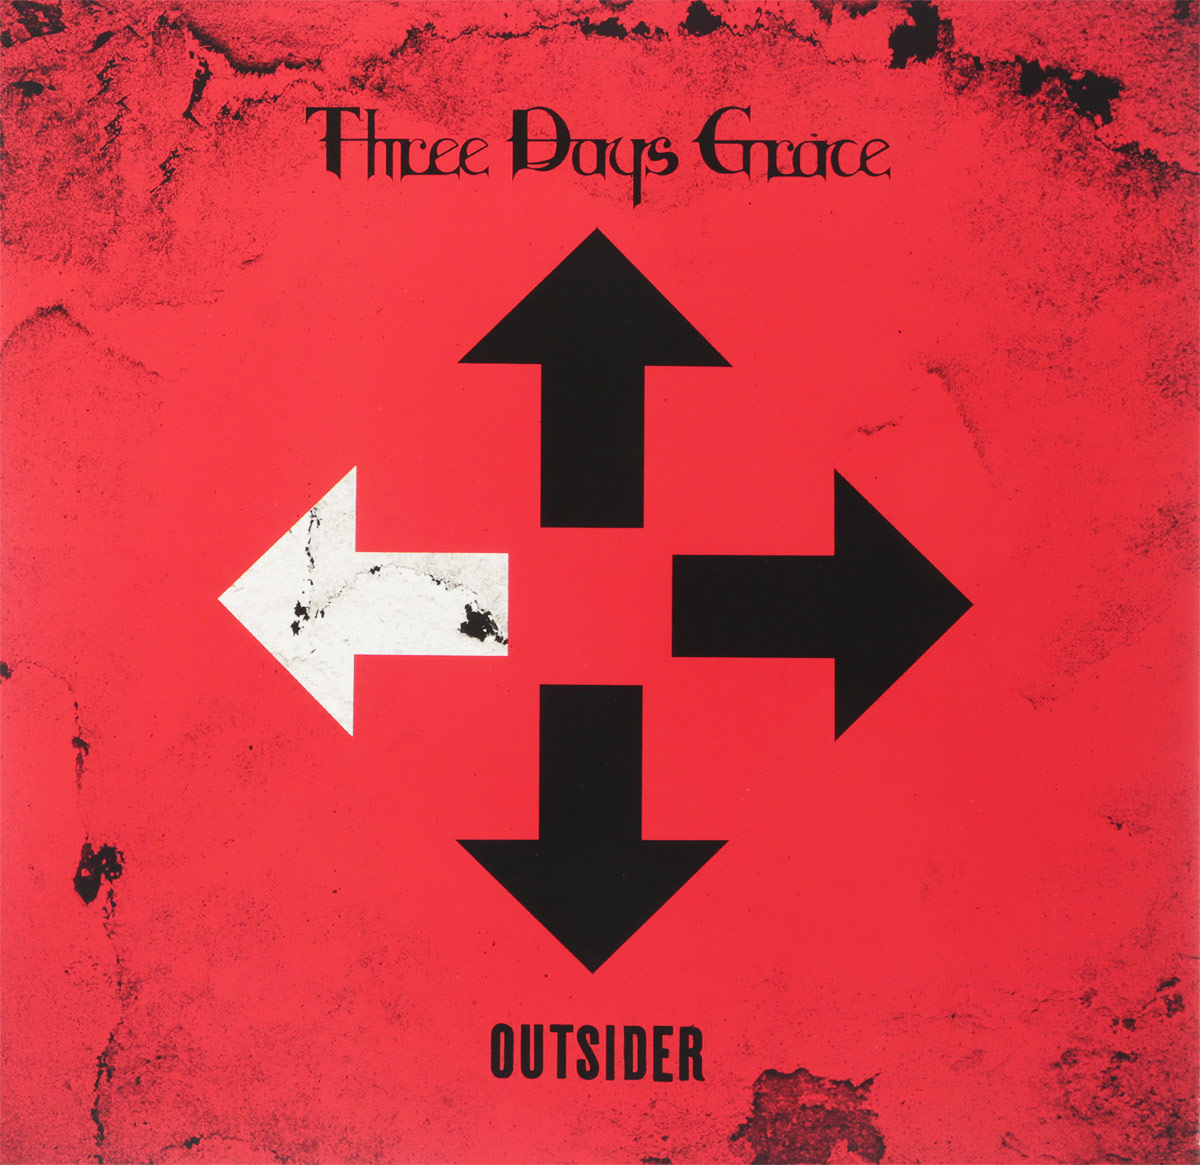 Three Days Grace Three Days Grace. Outsider three days grace three days grace human